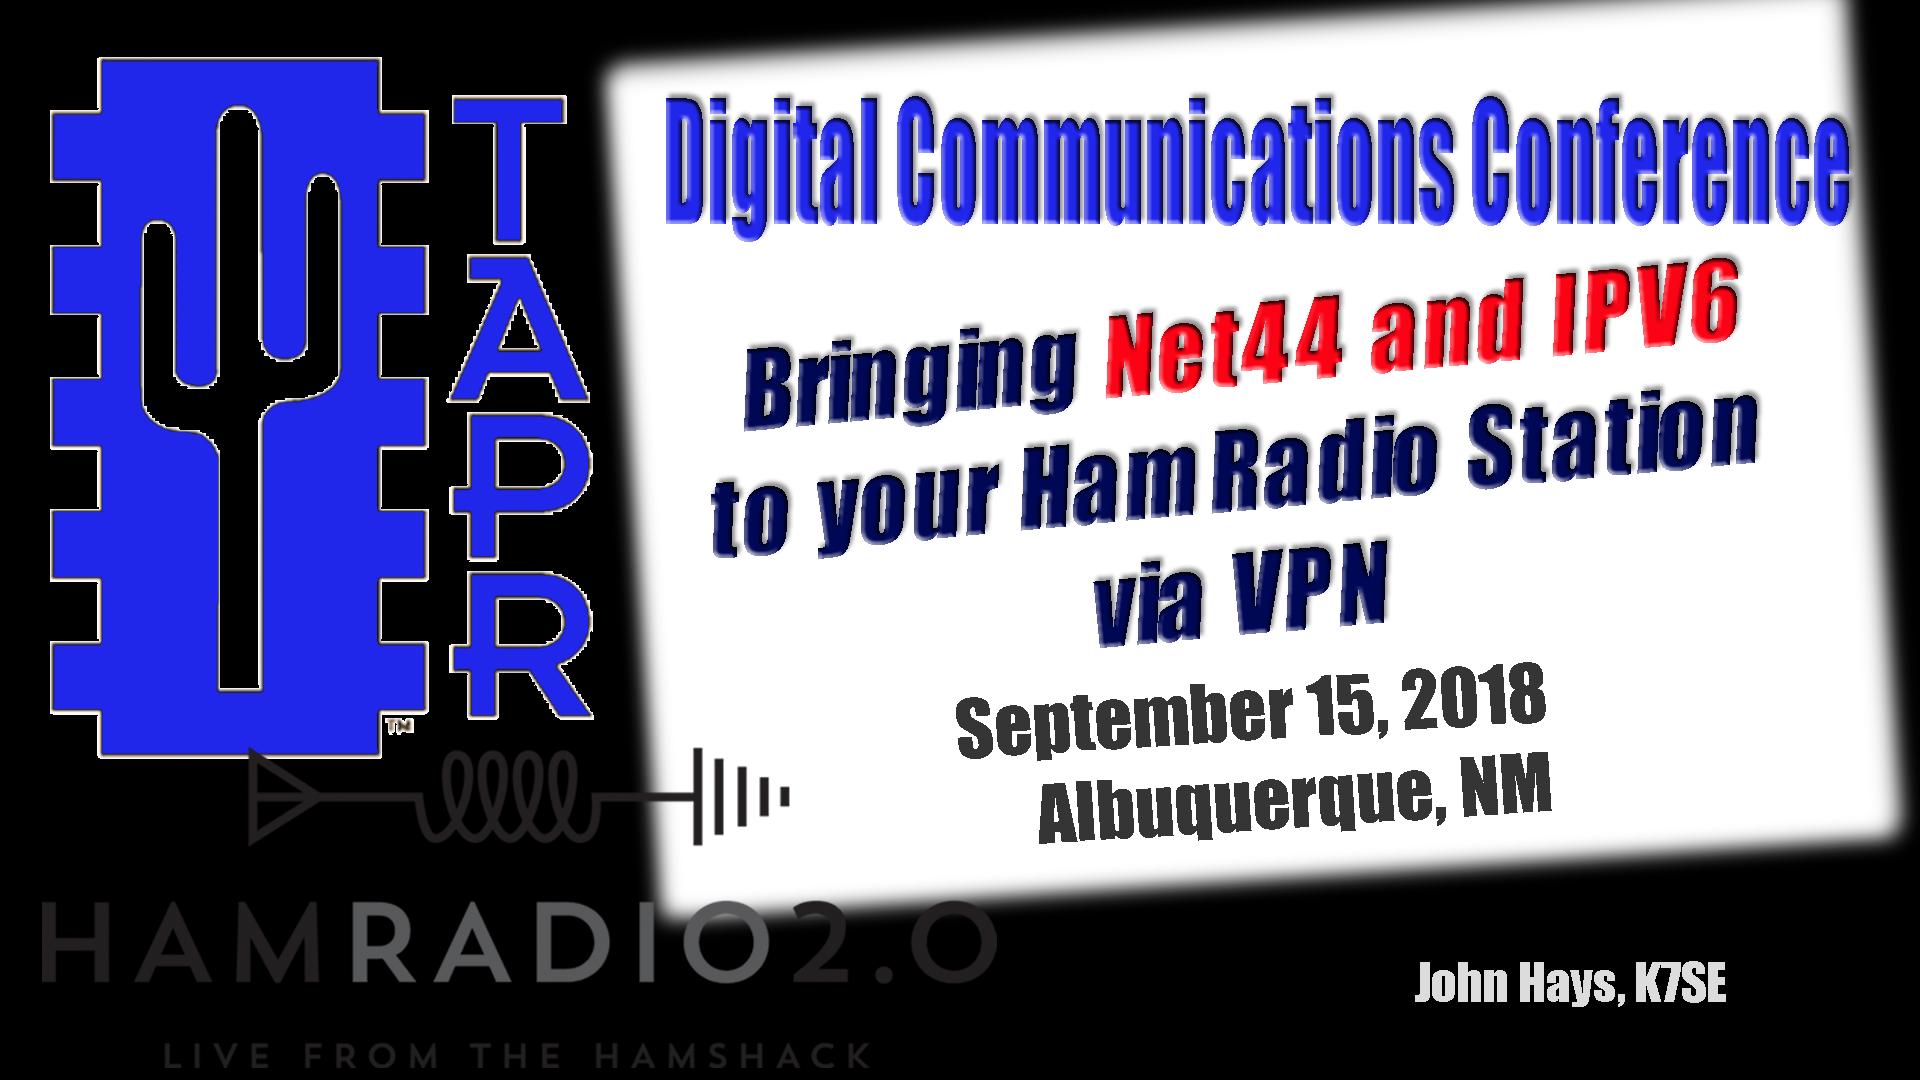 Episode 171: Bringing Net44 and IPV6 to your Ham Radio Station via VPN